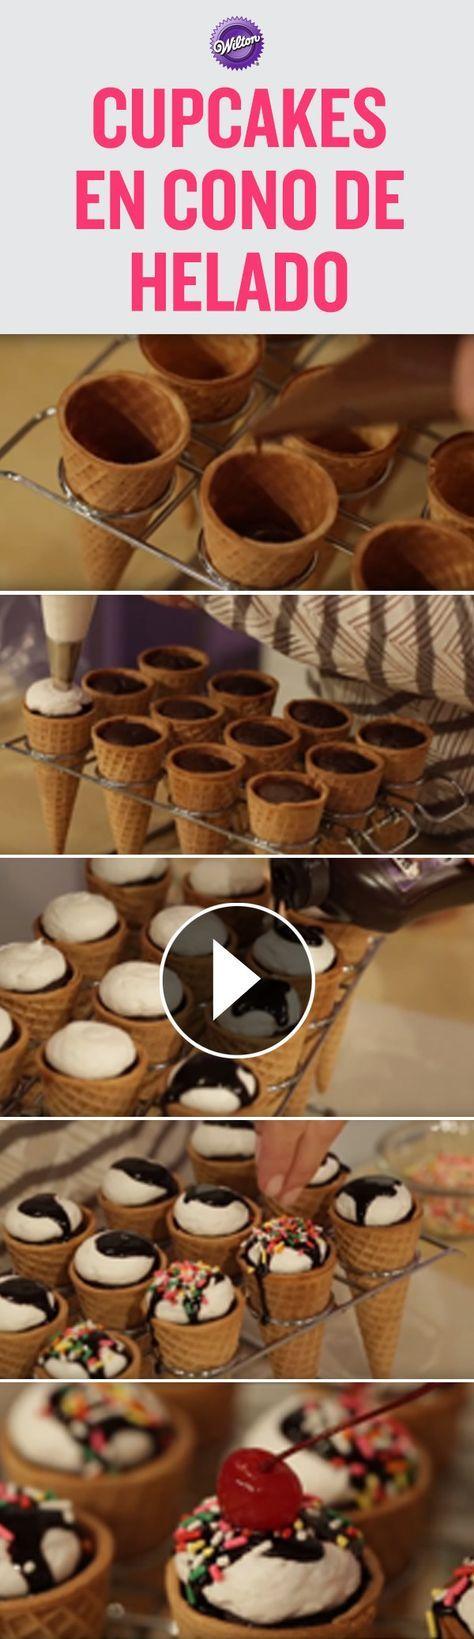 M s de 25 ideas incre bles sobre pastelitos de cono de helado que te gustar n en pinterest - Calorias de un cono de helado ...